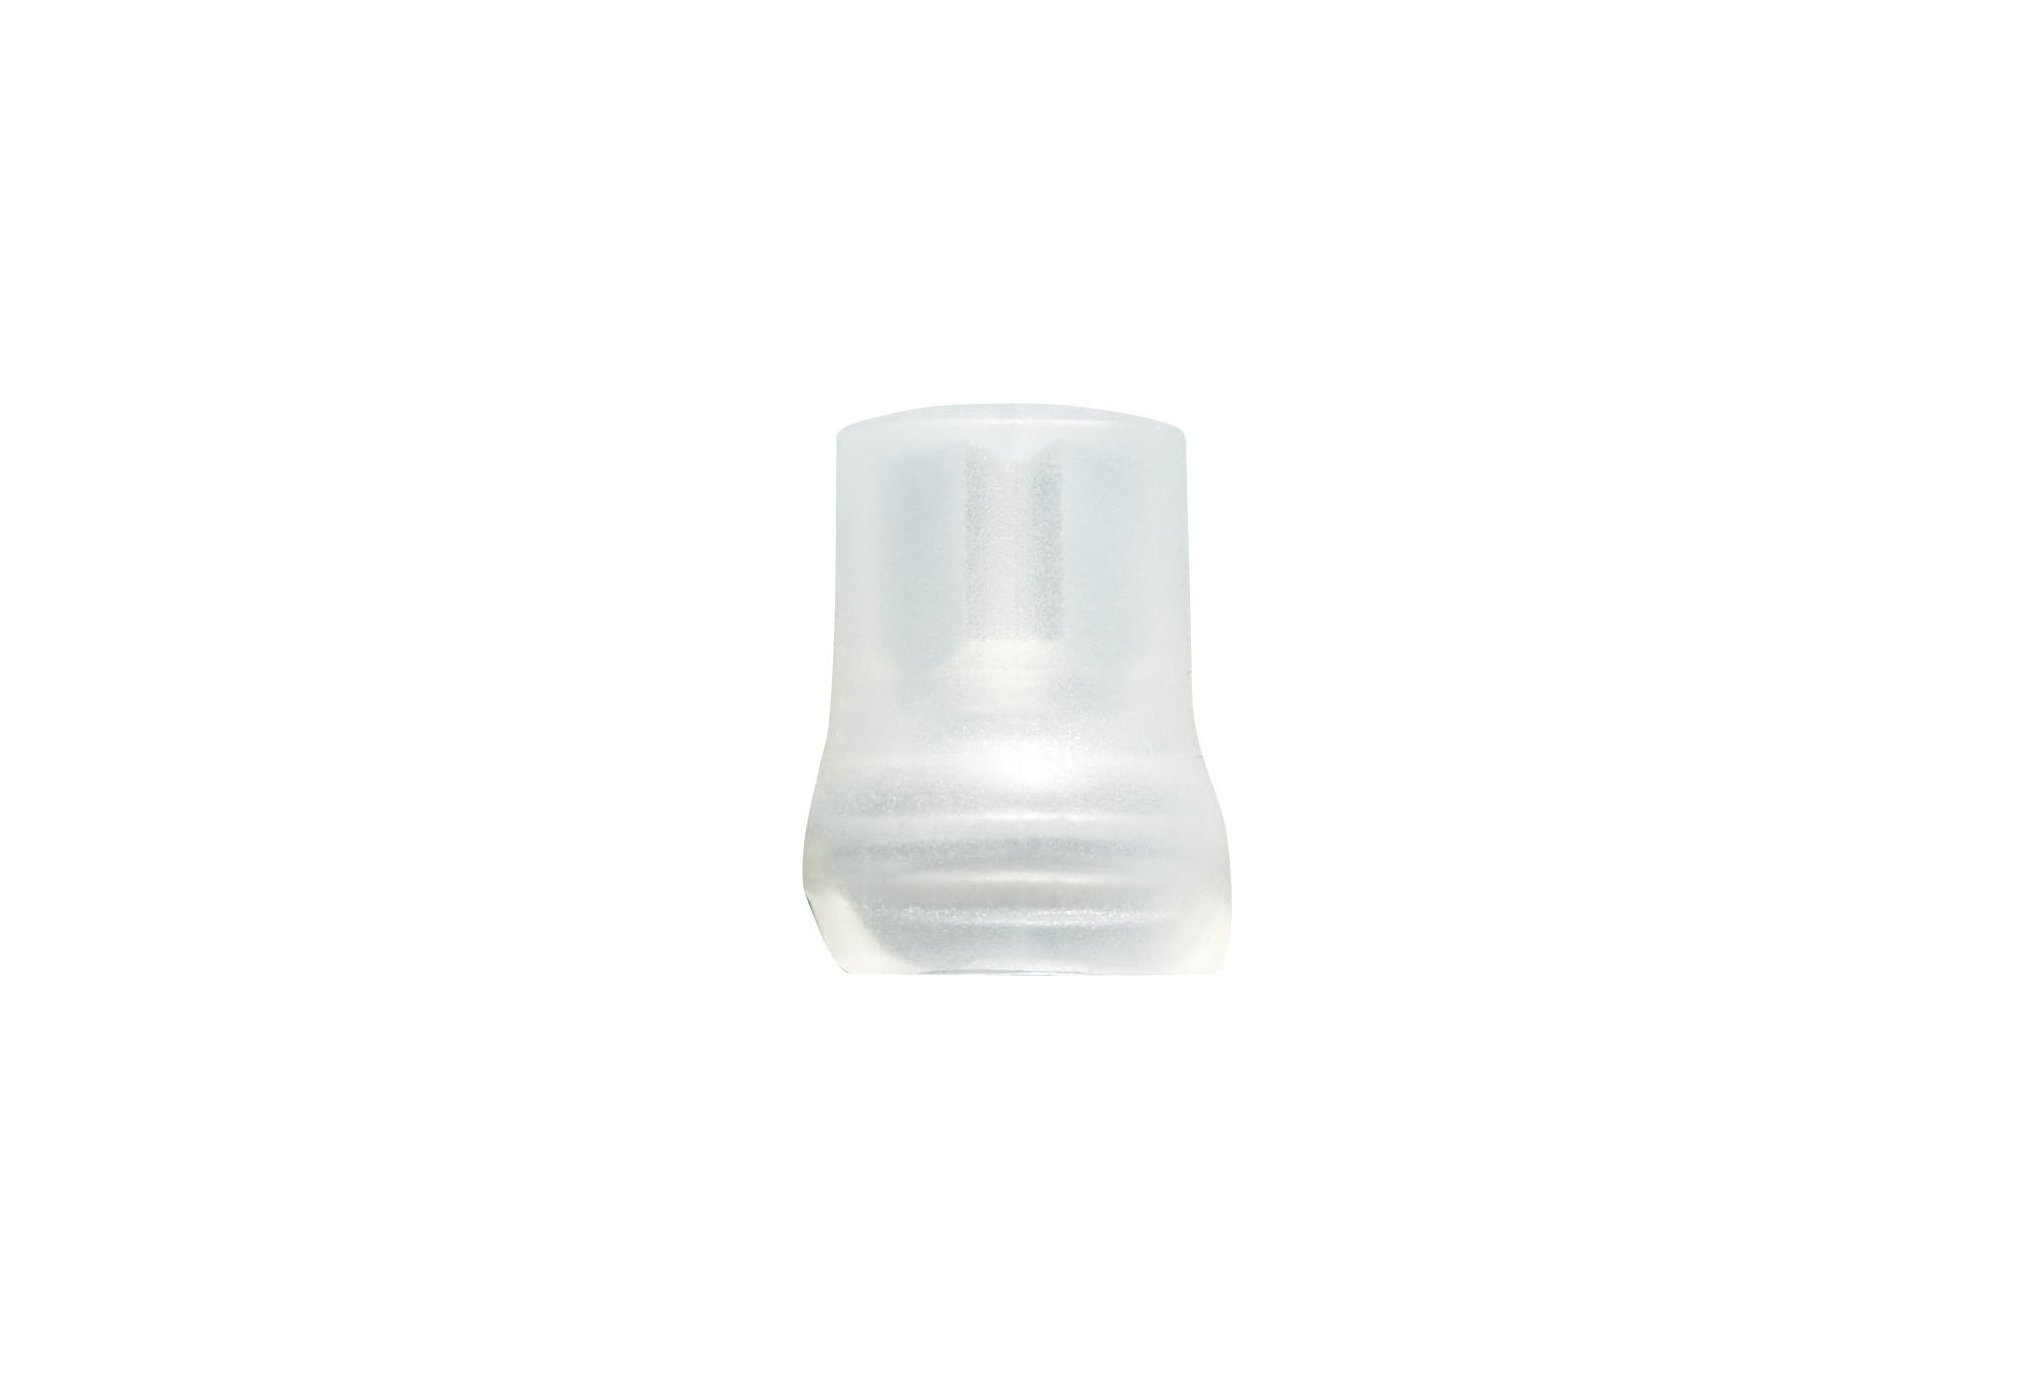 Camelbak Quick Stow / Bite Valve Sac hydratation / Gourde